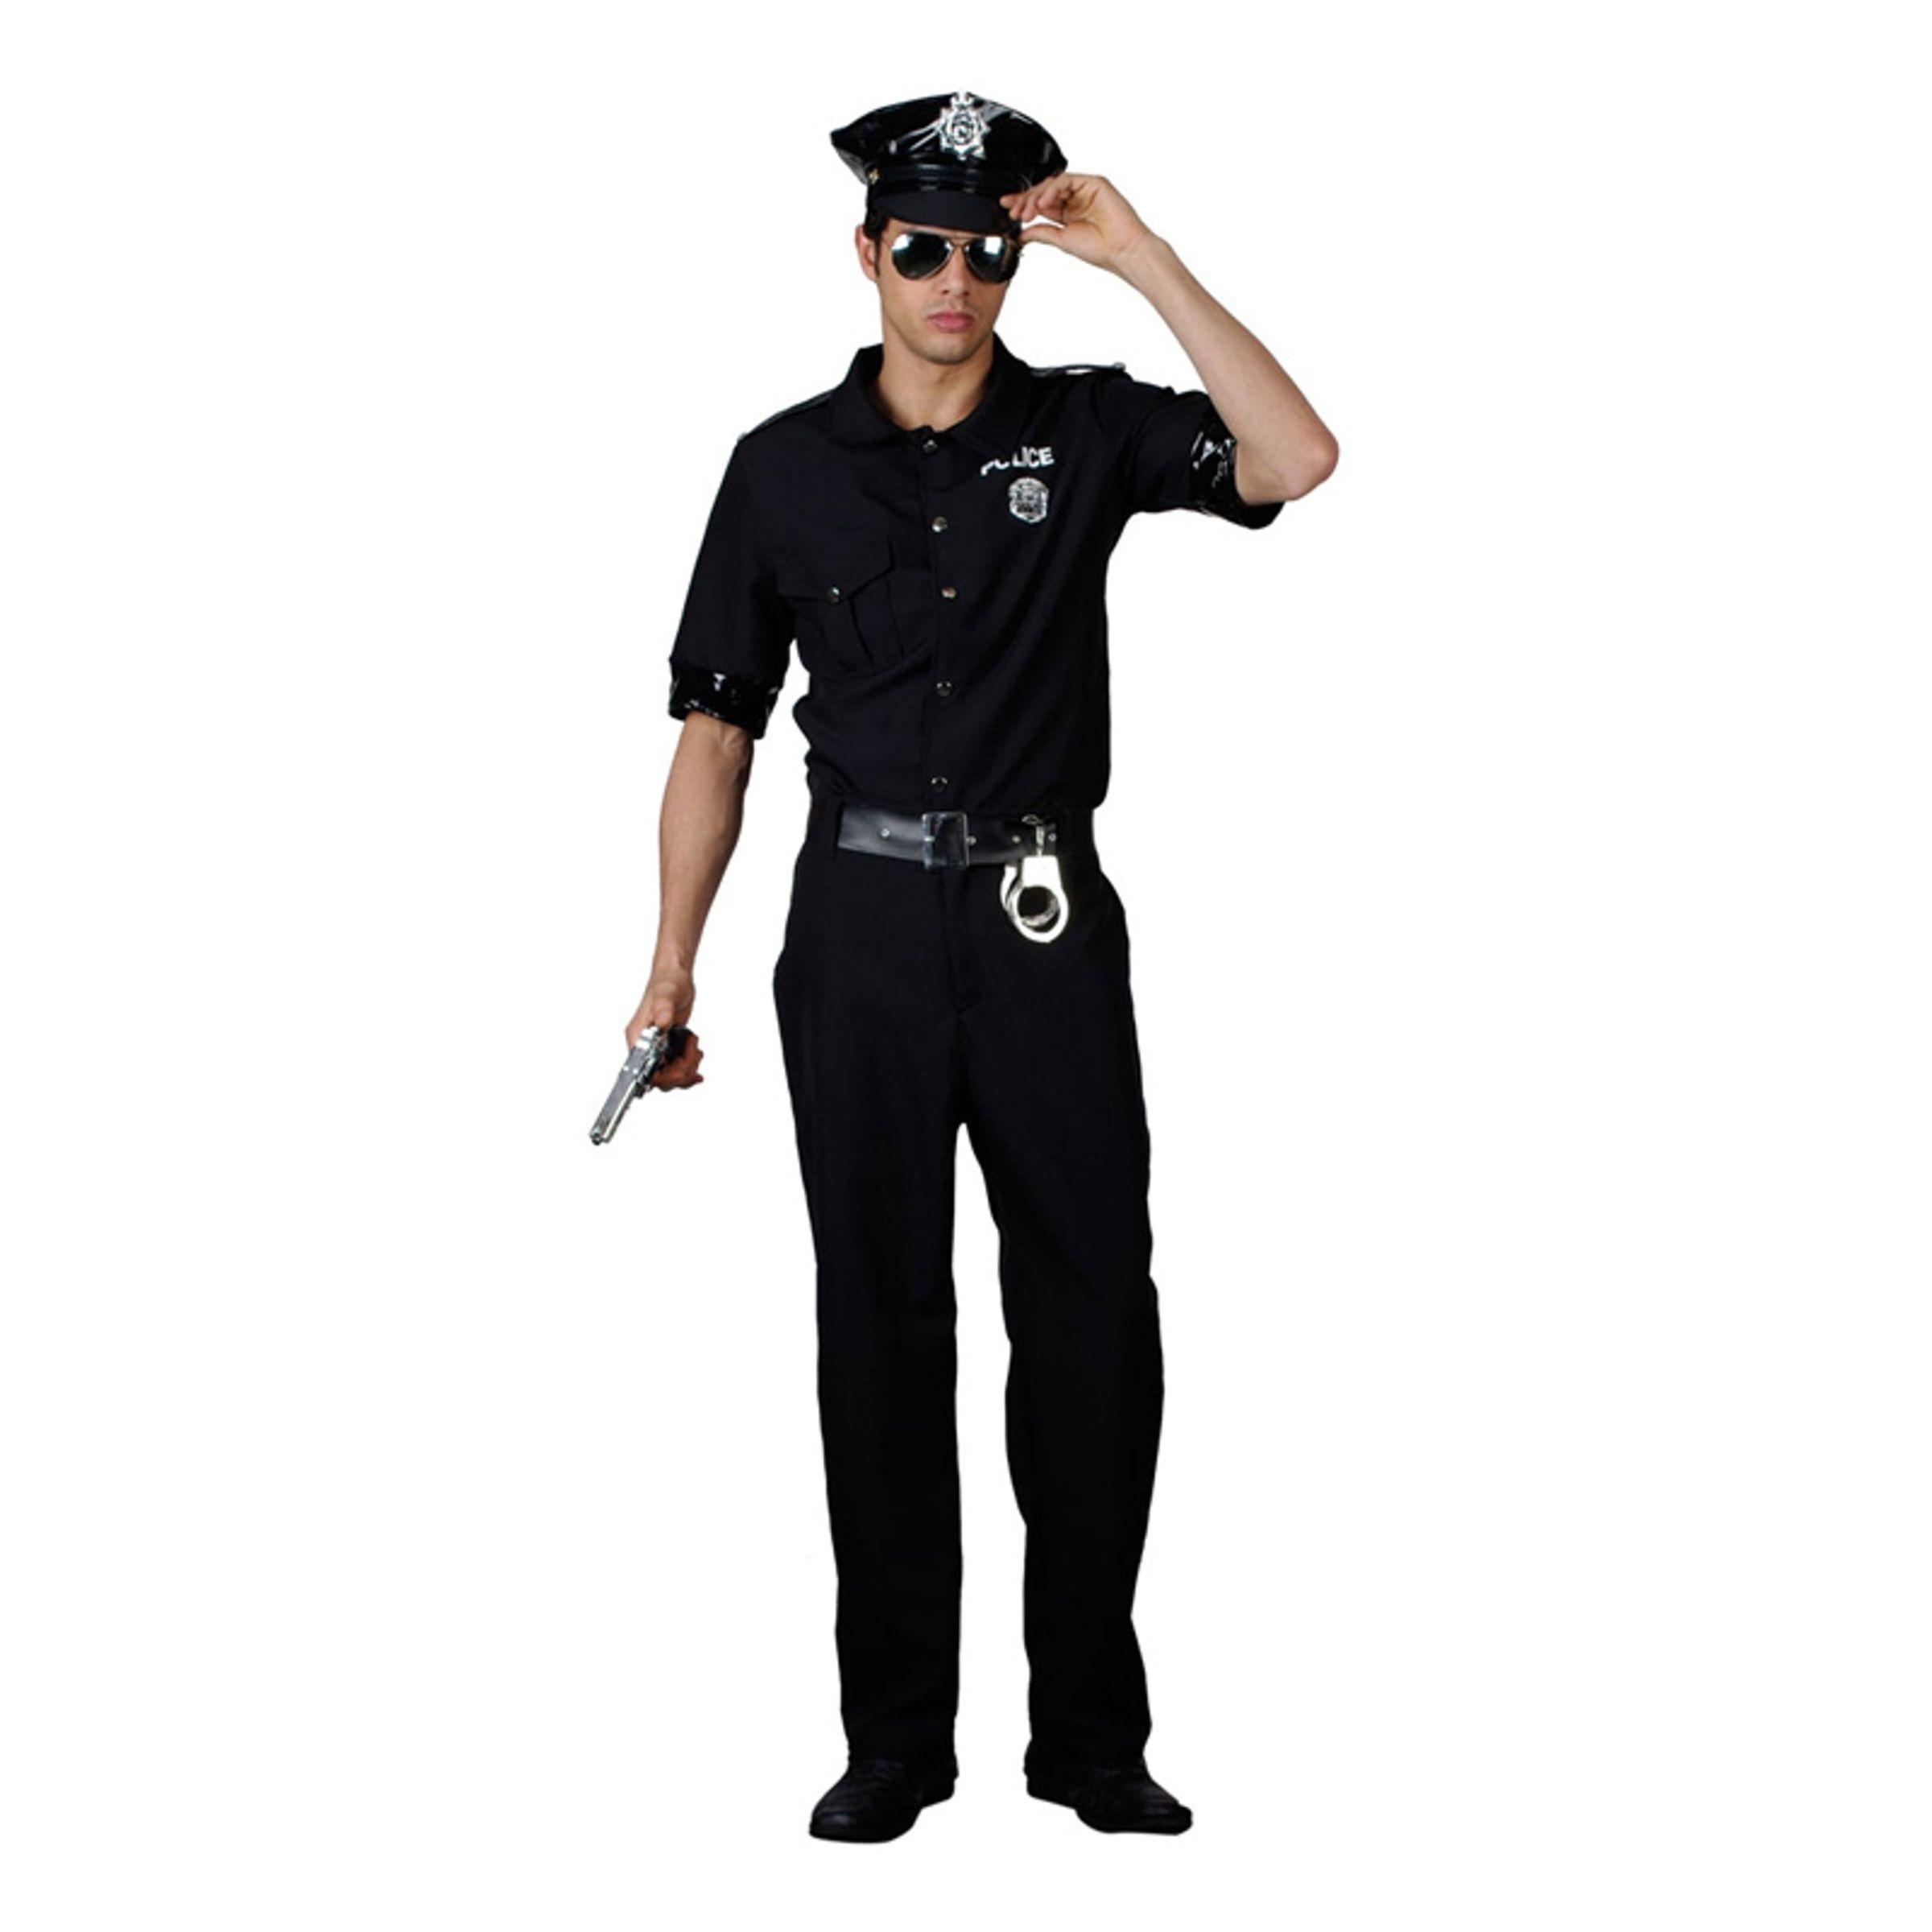 New York Polis Maskeraddräkt - X-Large